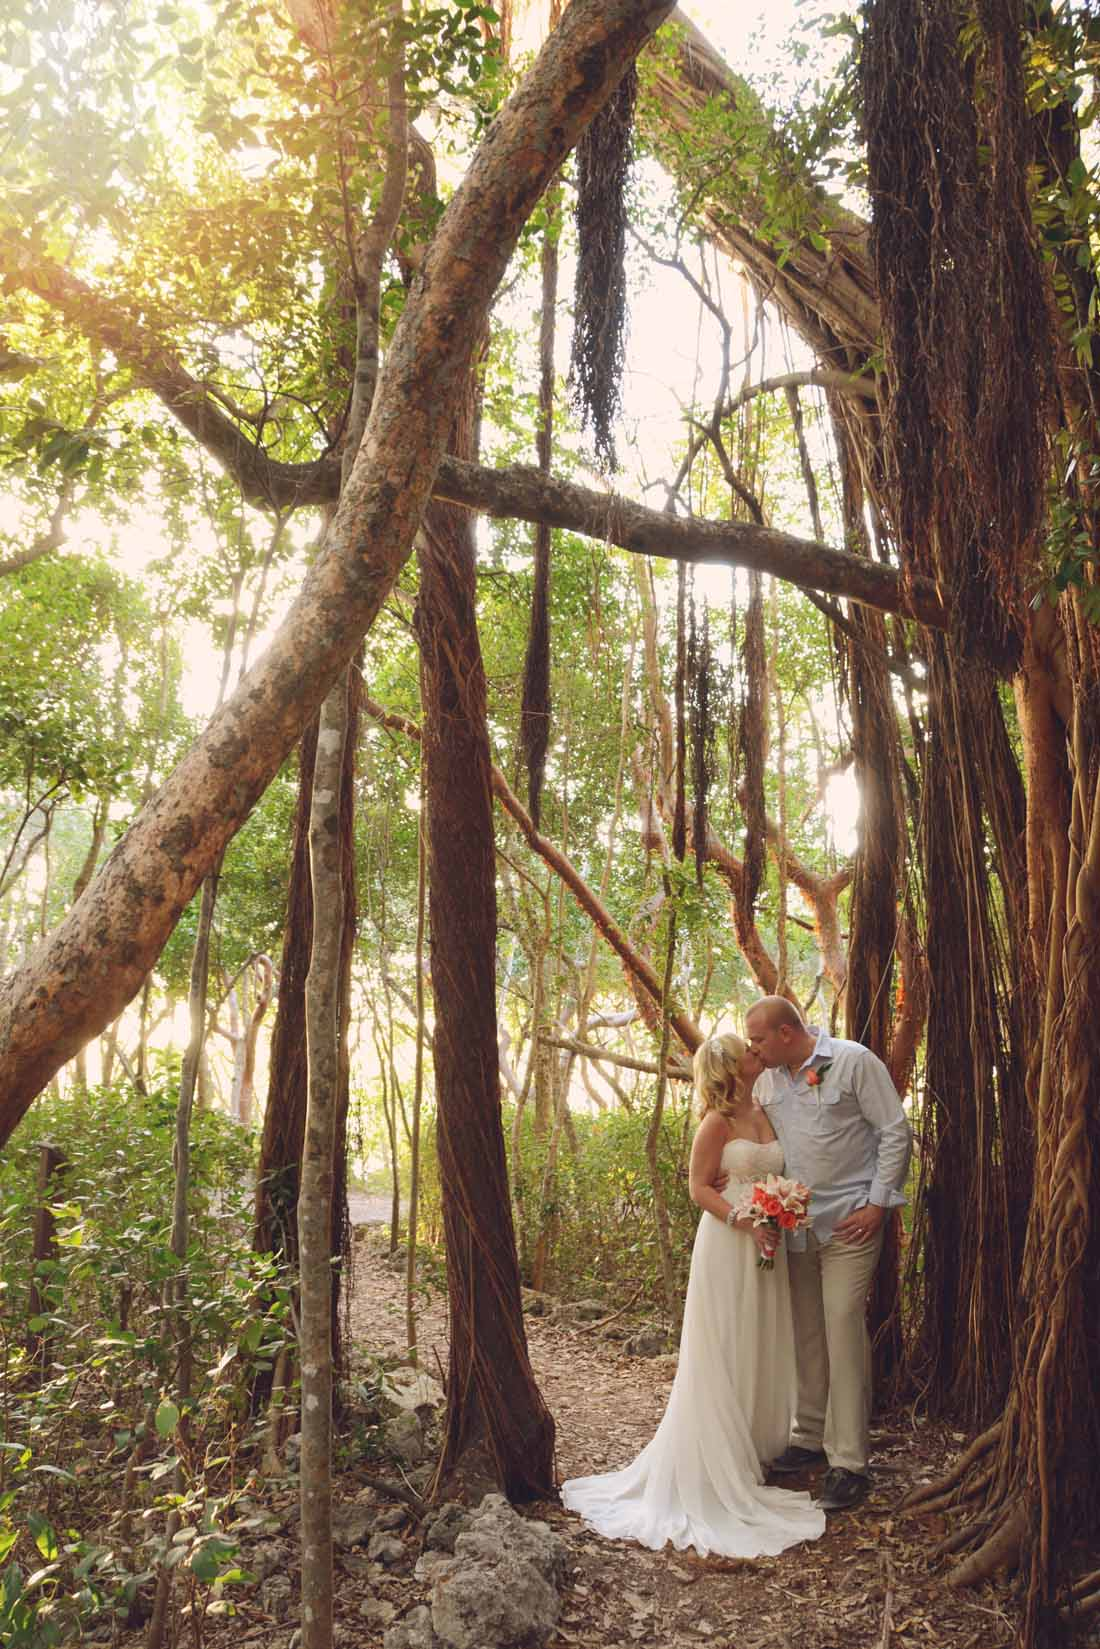 C 2016 MPV Intimate Weddings (12).jpg